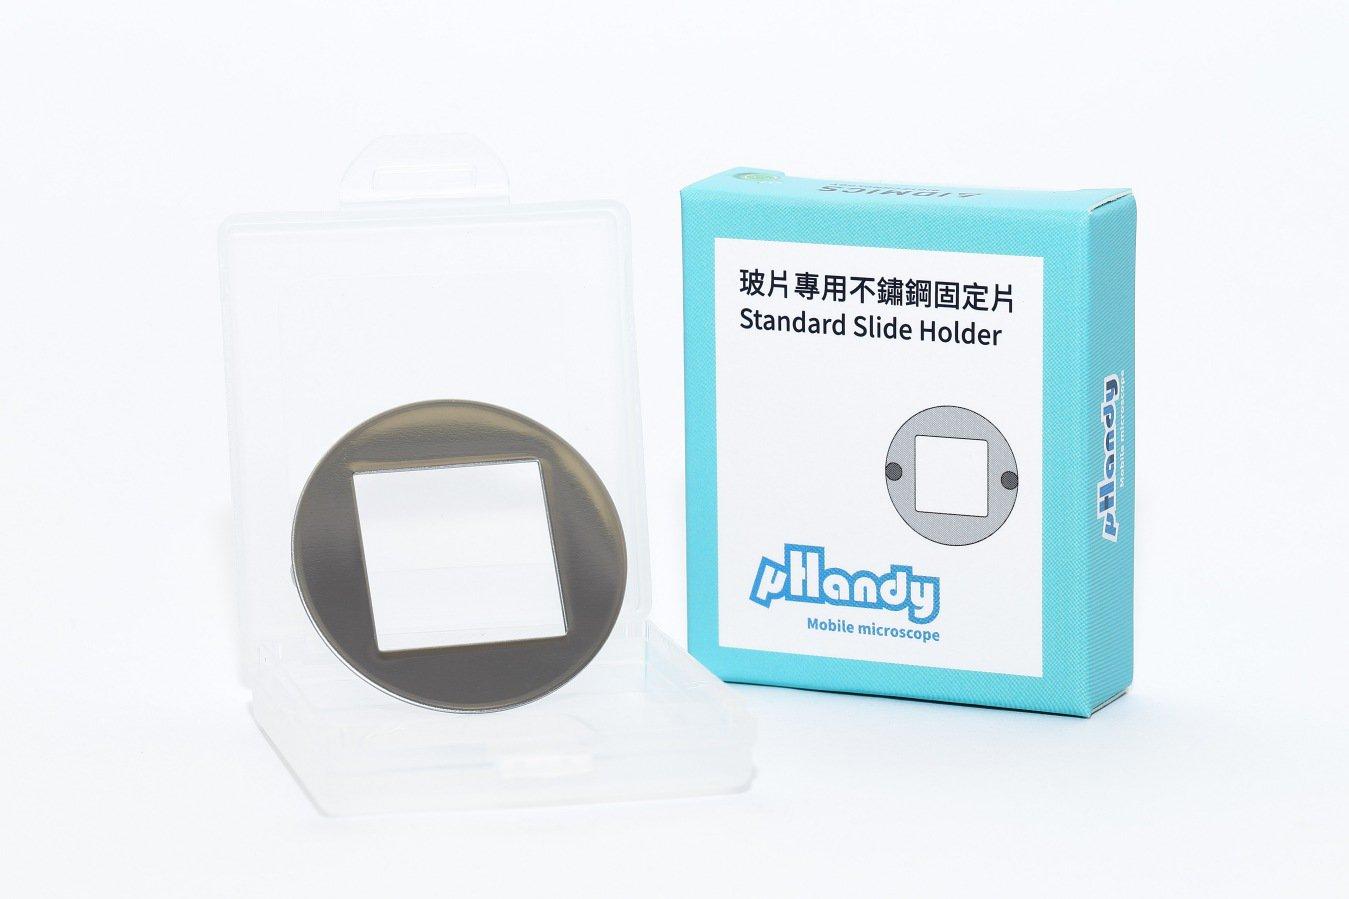 Aidmics Biotechnology スマホ顕微鏡 μHandy Basic & 高倍率レンズクリップセット【画像27】